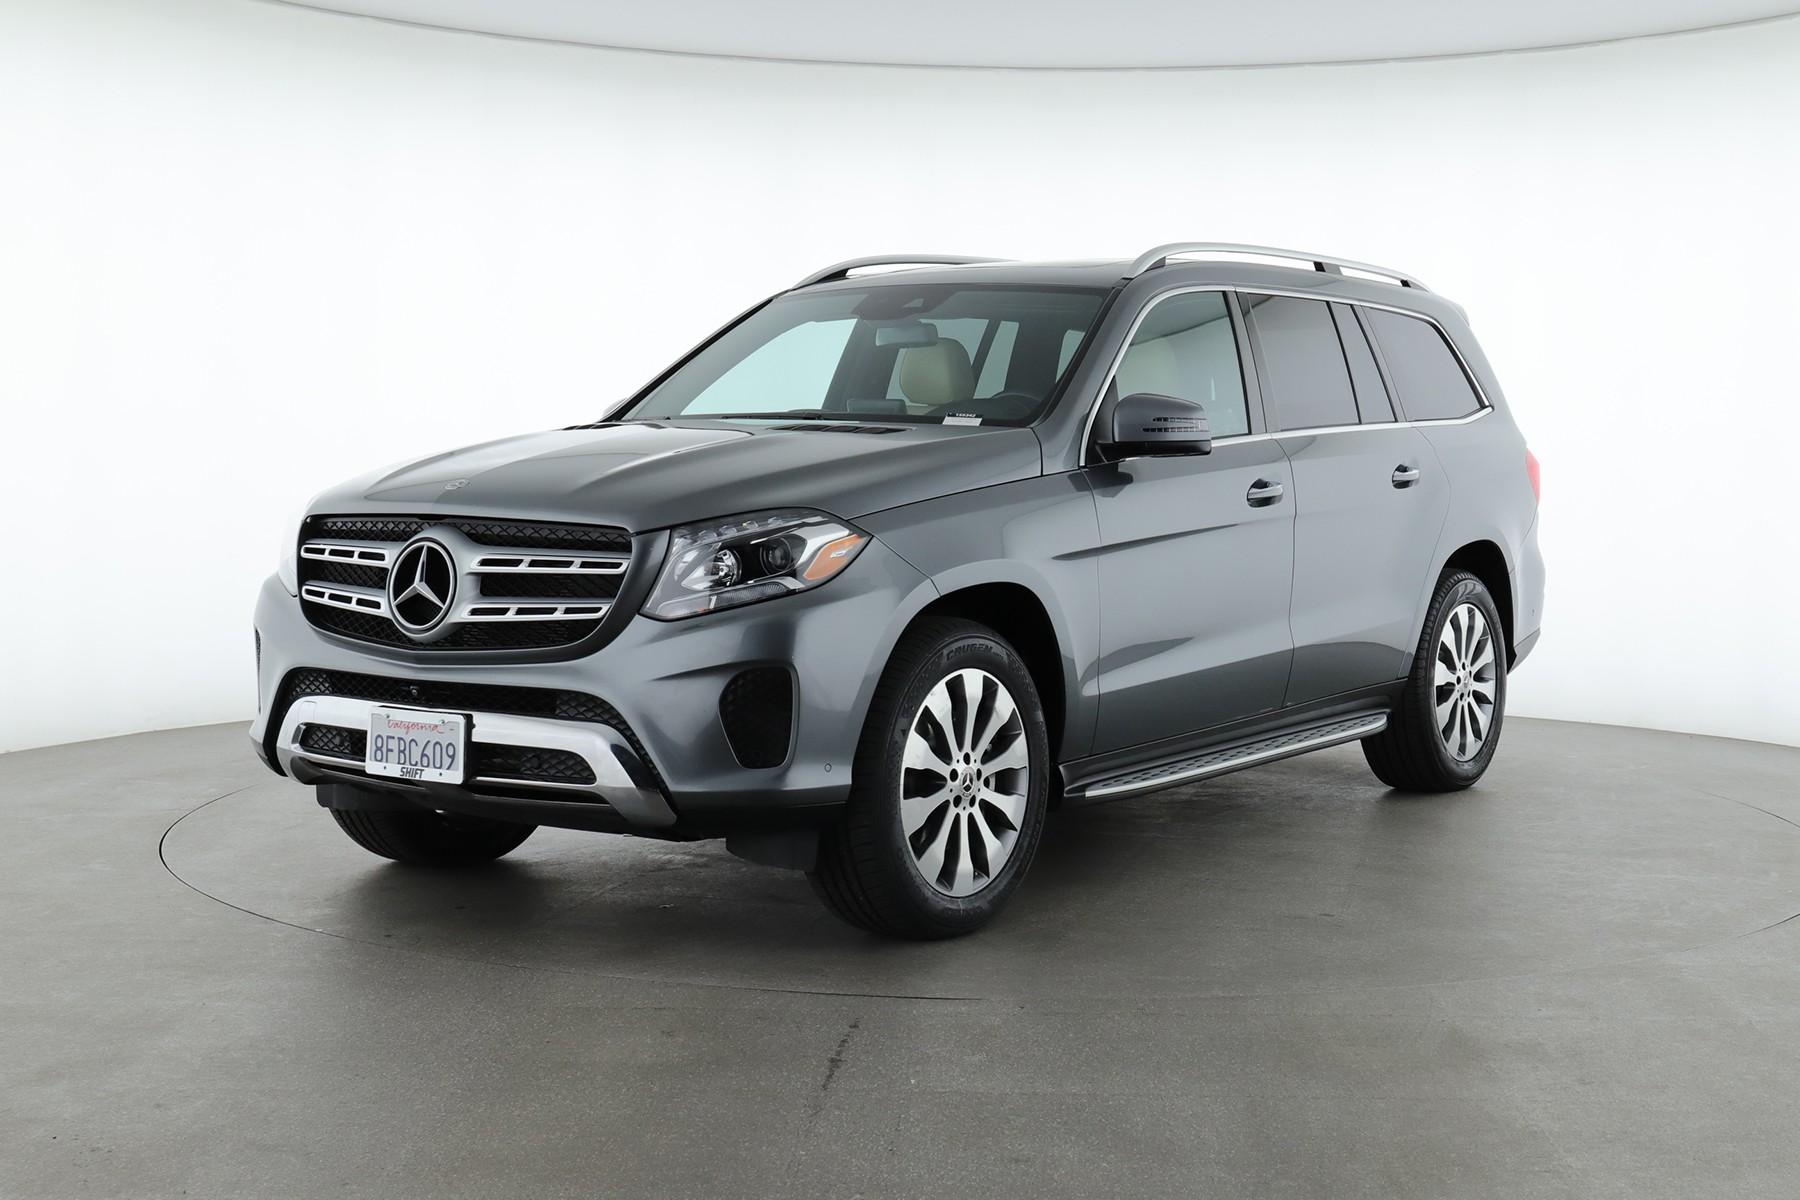 2018 Mercedes-Benz GLS 450 (from $49,950)